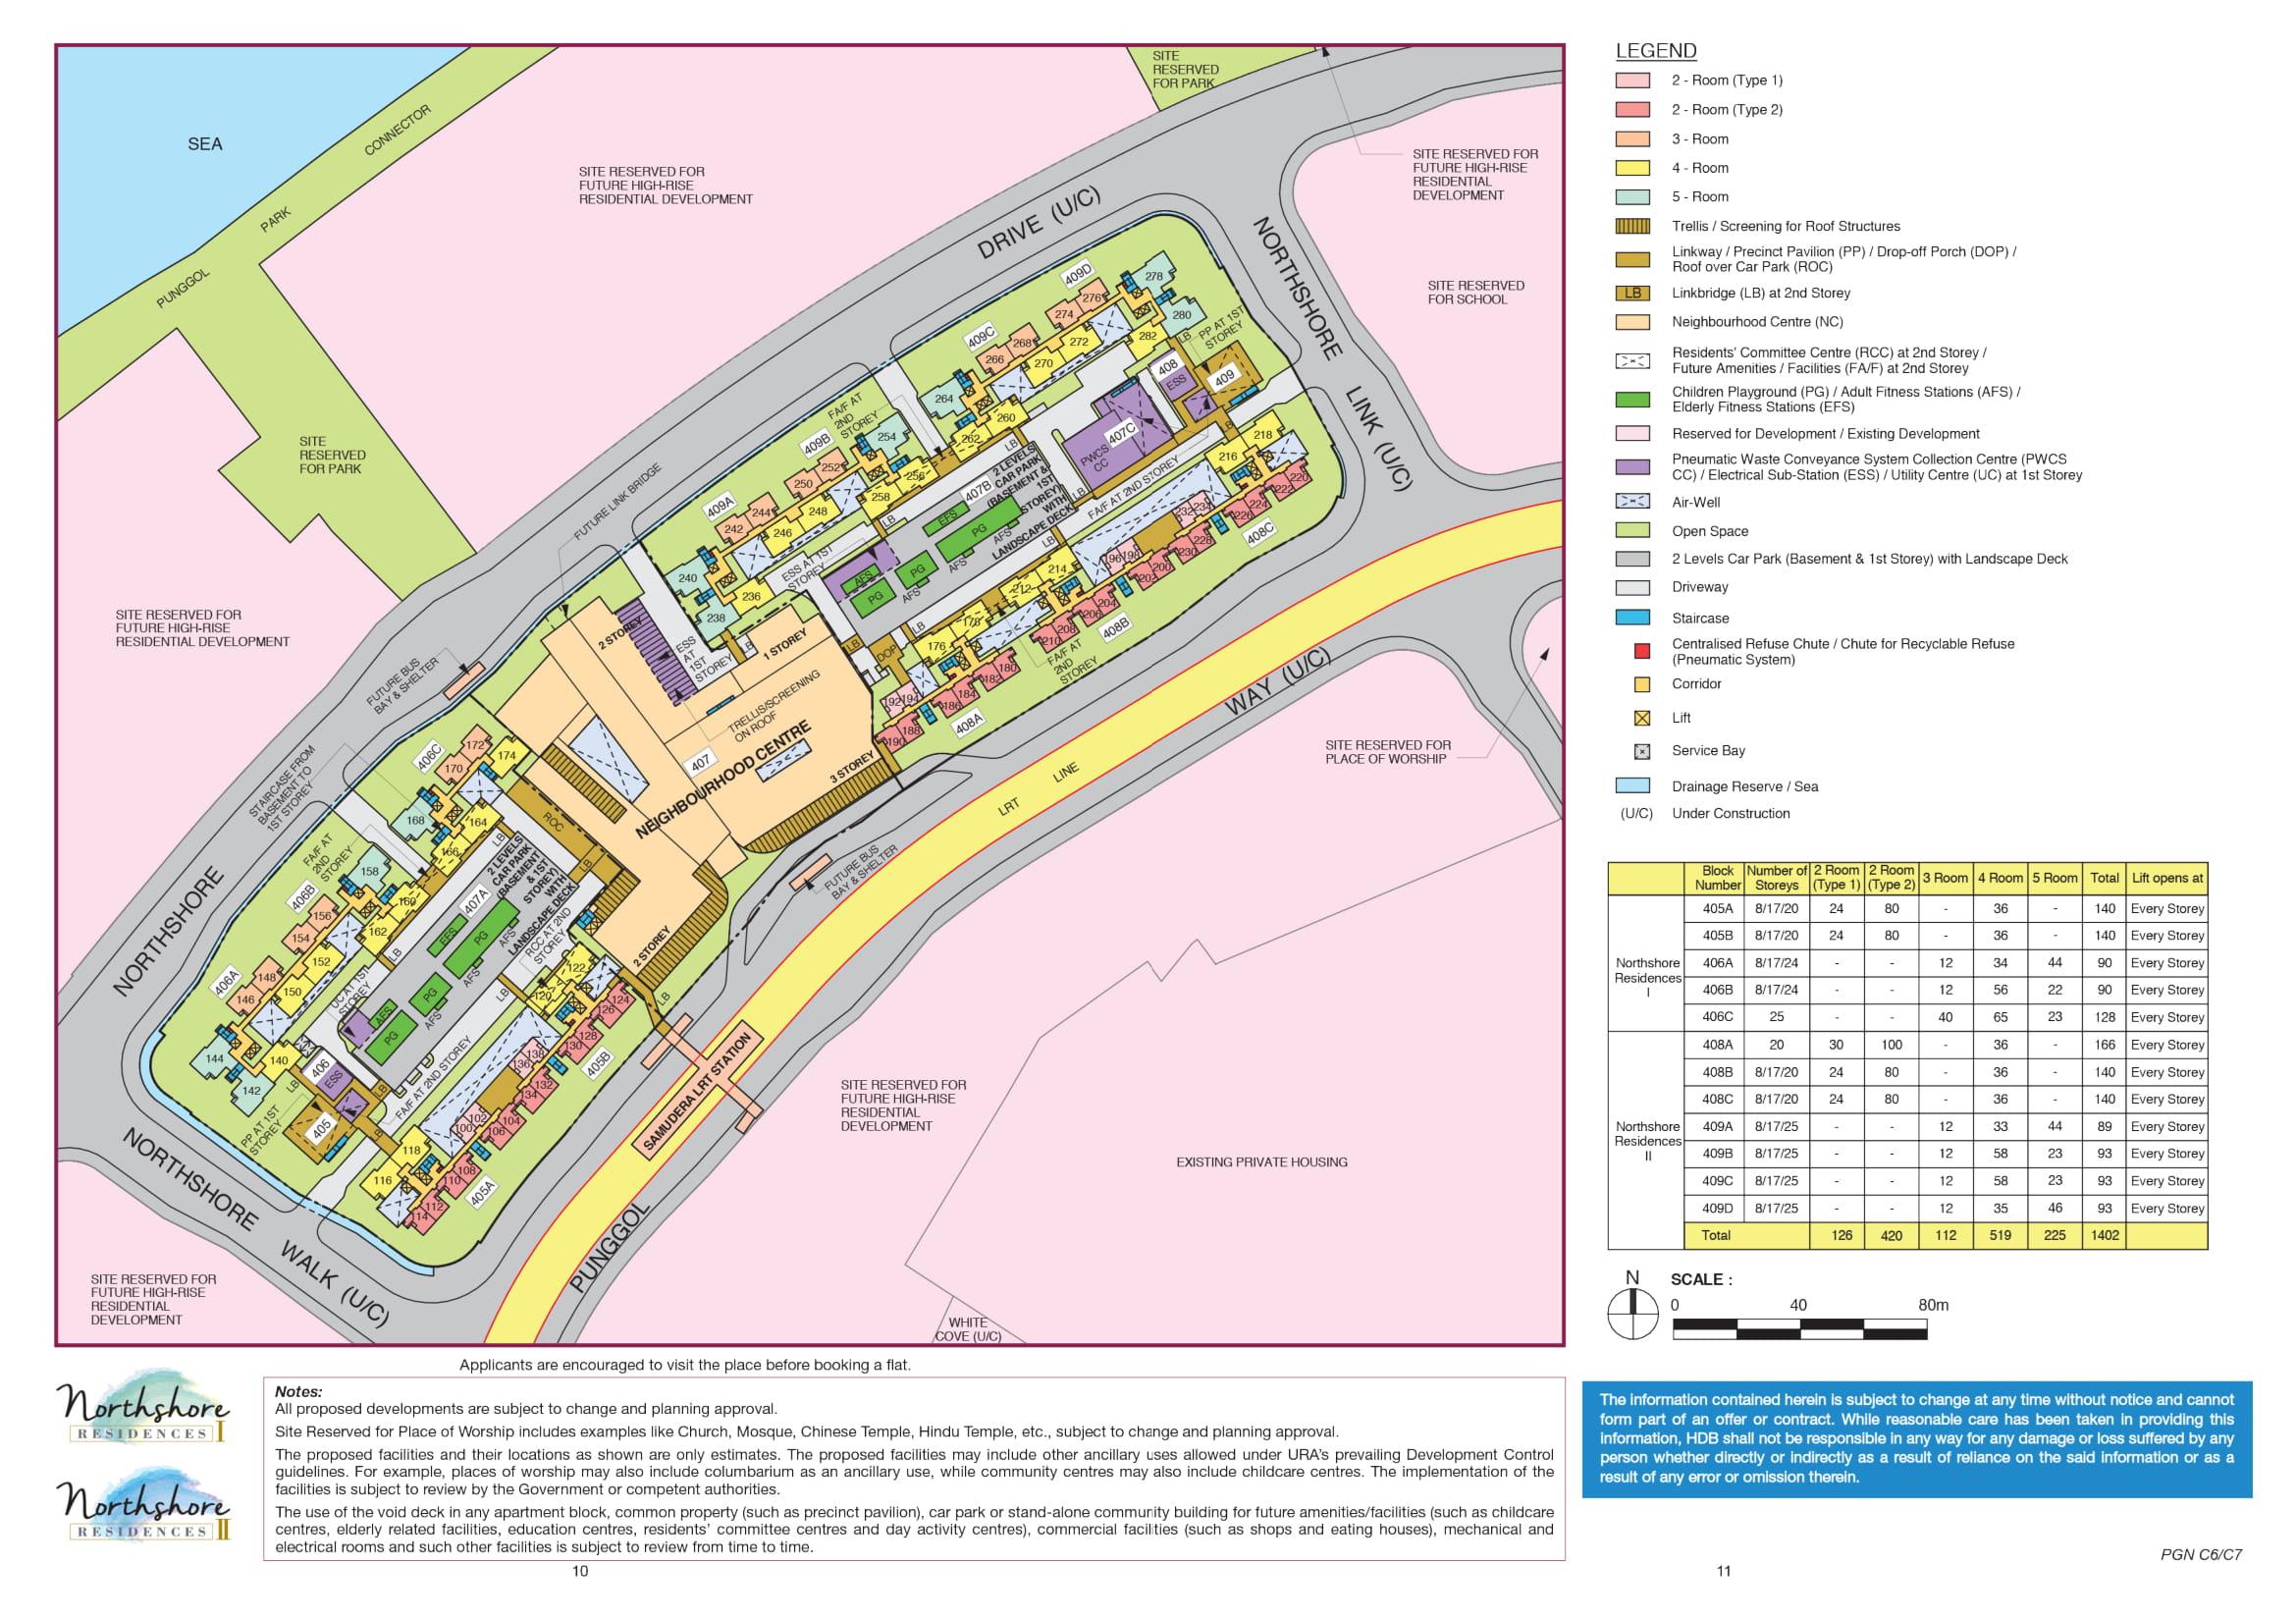 Northshore Residences I Site Plan